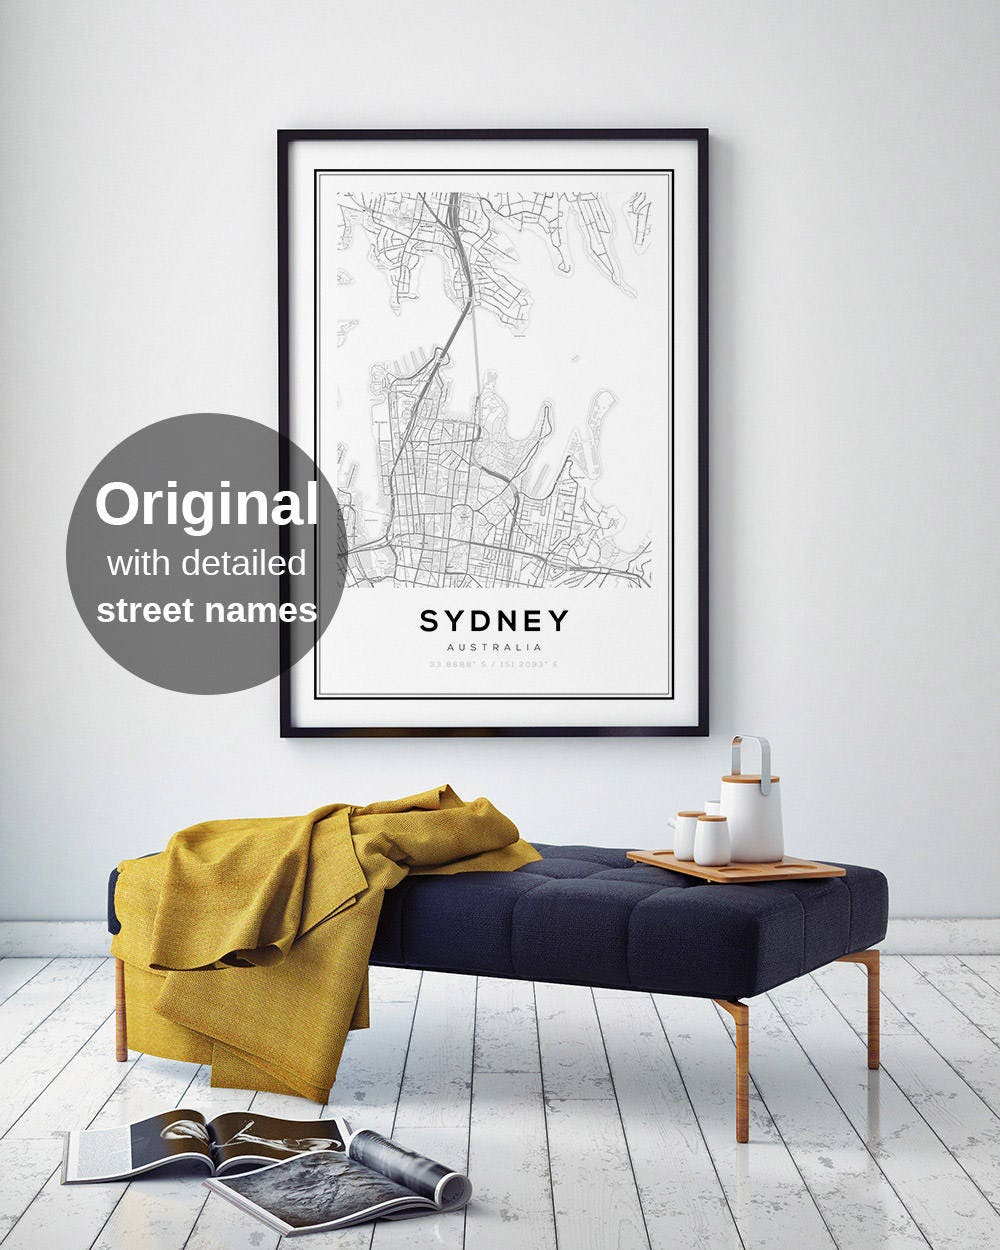 sydney map print sydney city sydney map poster australia city map print black and white map australia map print digital wall art